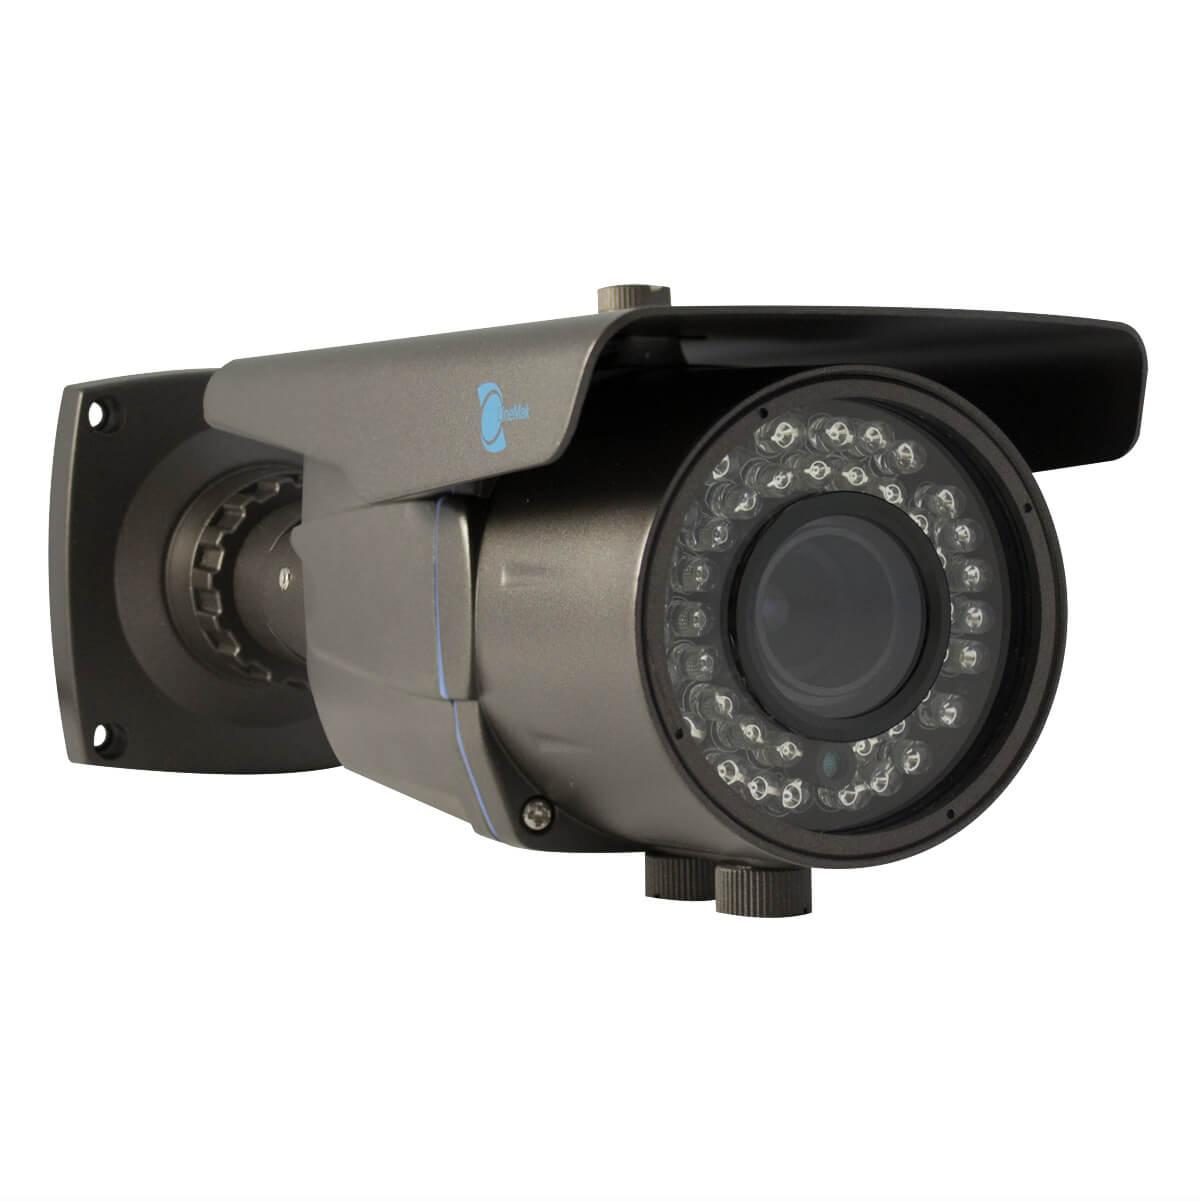 "1/3""Sony 960H CCD Sensor effio 700TVL High-resolution 4140 ...   Ccd Sensor Camera"